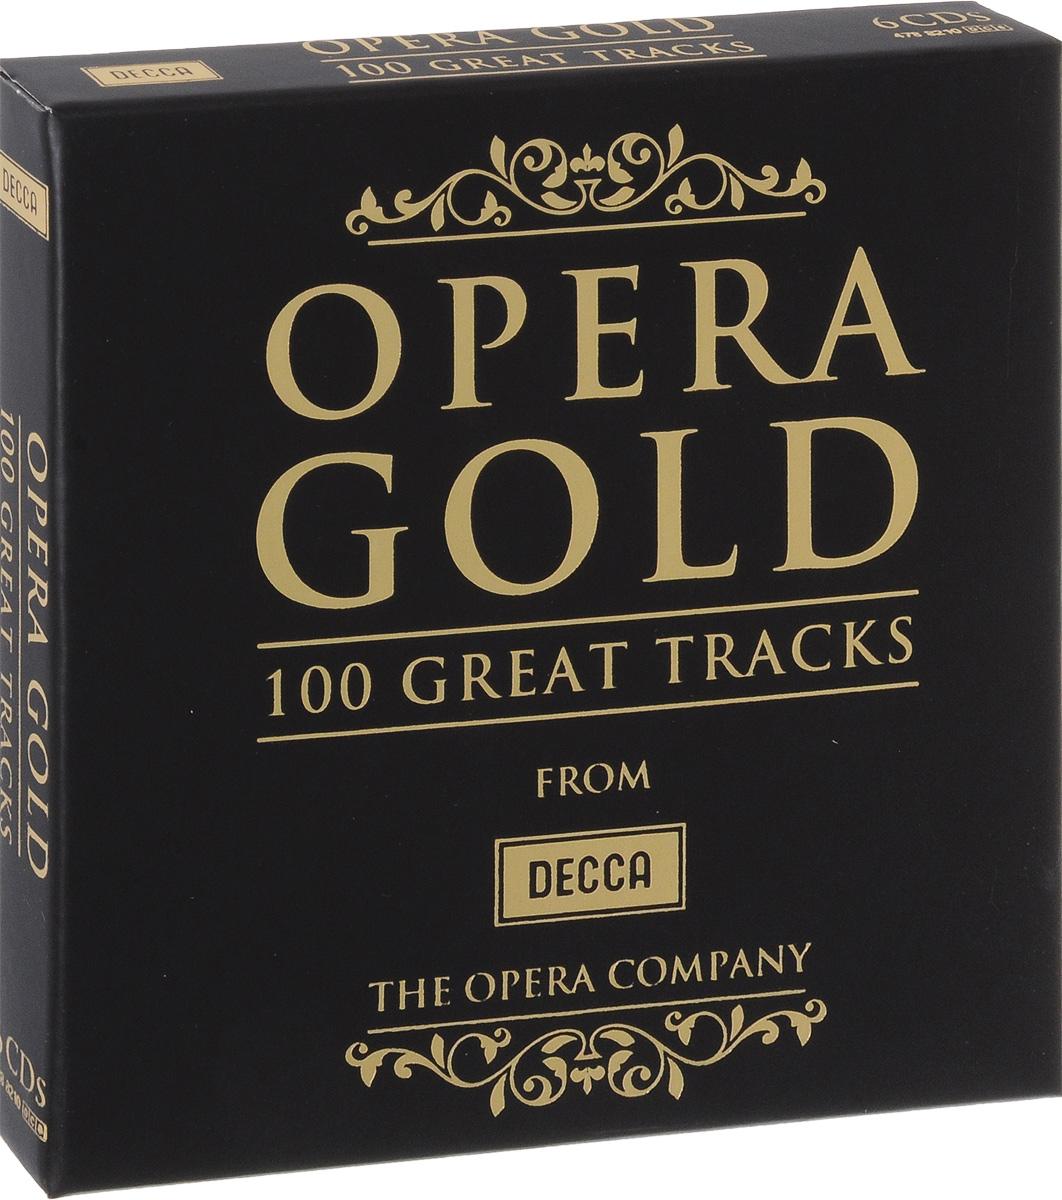 Opera Gold. 100 Great Tracks (6 CD) 100 great street photographs